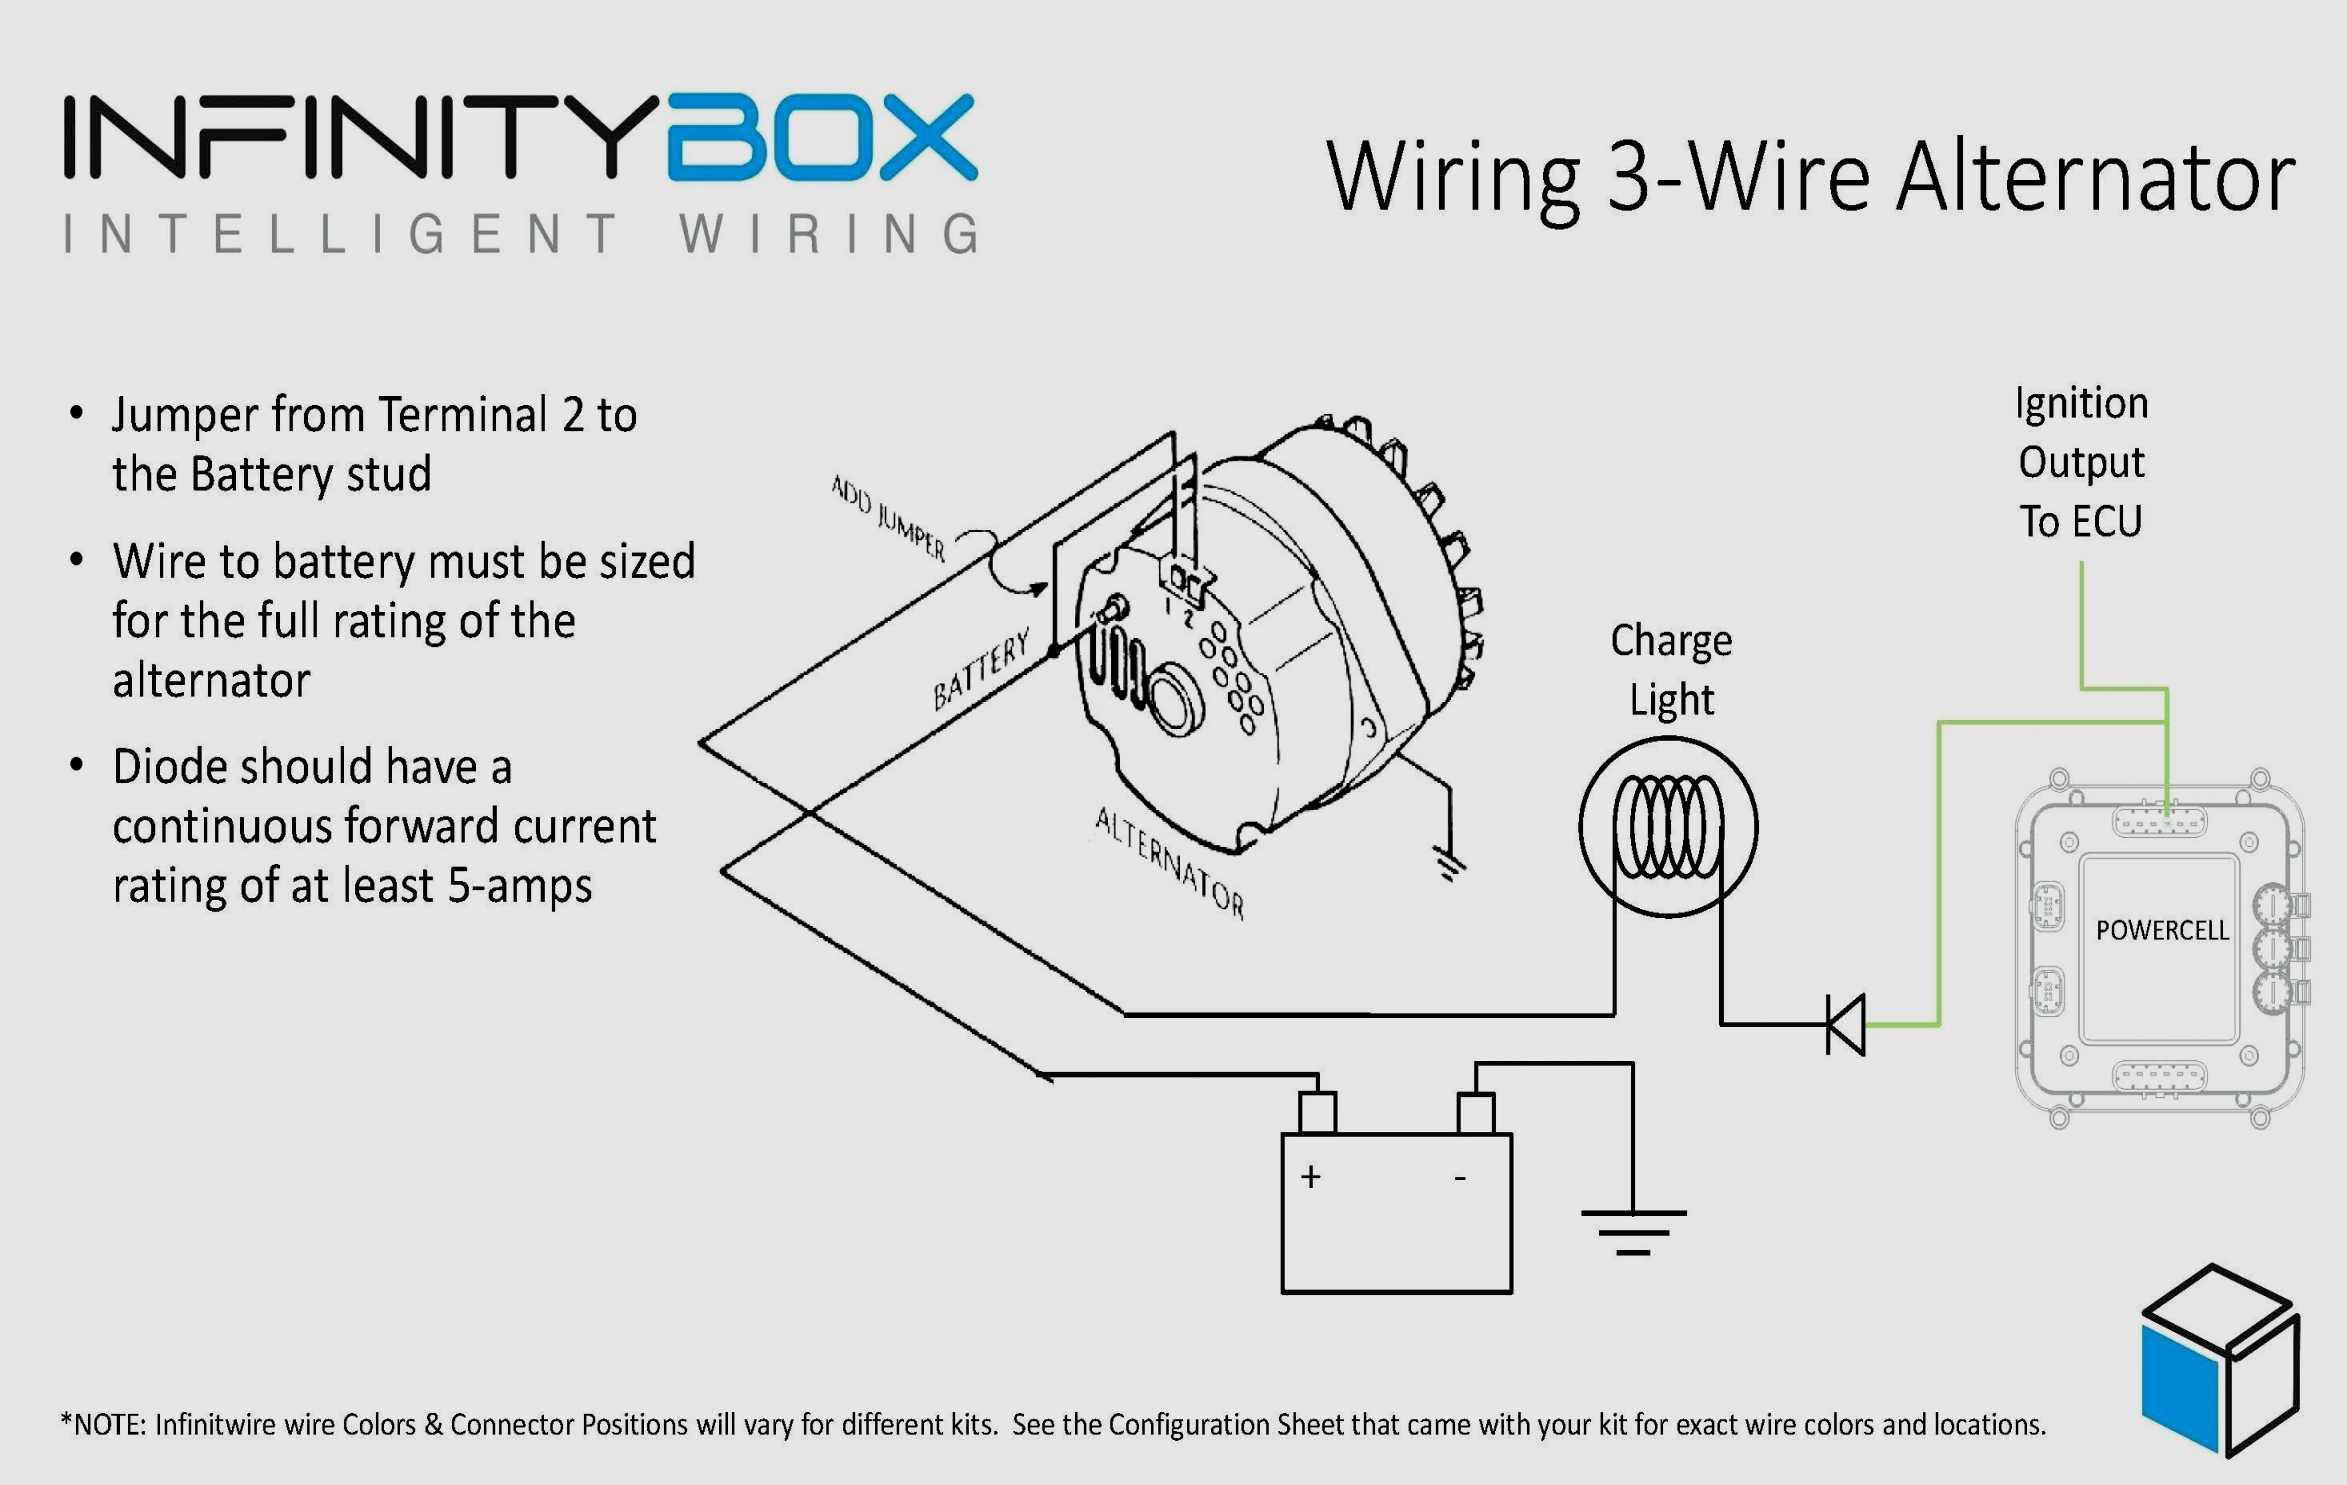 Honda Civic Ignition Switch Wiring Diagram | Best Wiring Library - Ford Tractor Ignition Switch Wiring Diagram